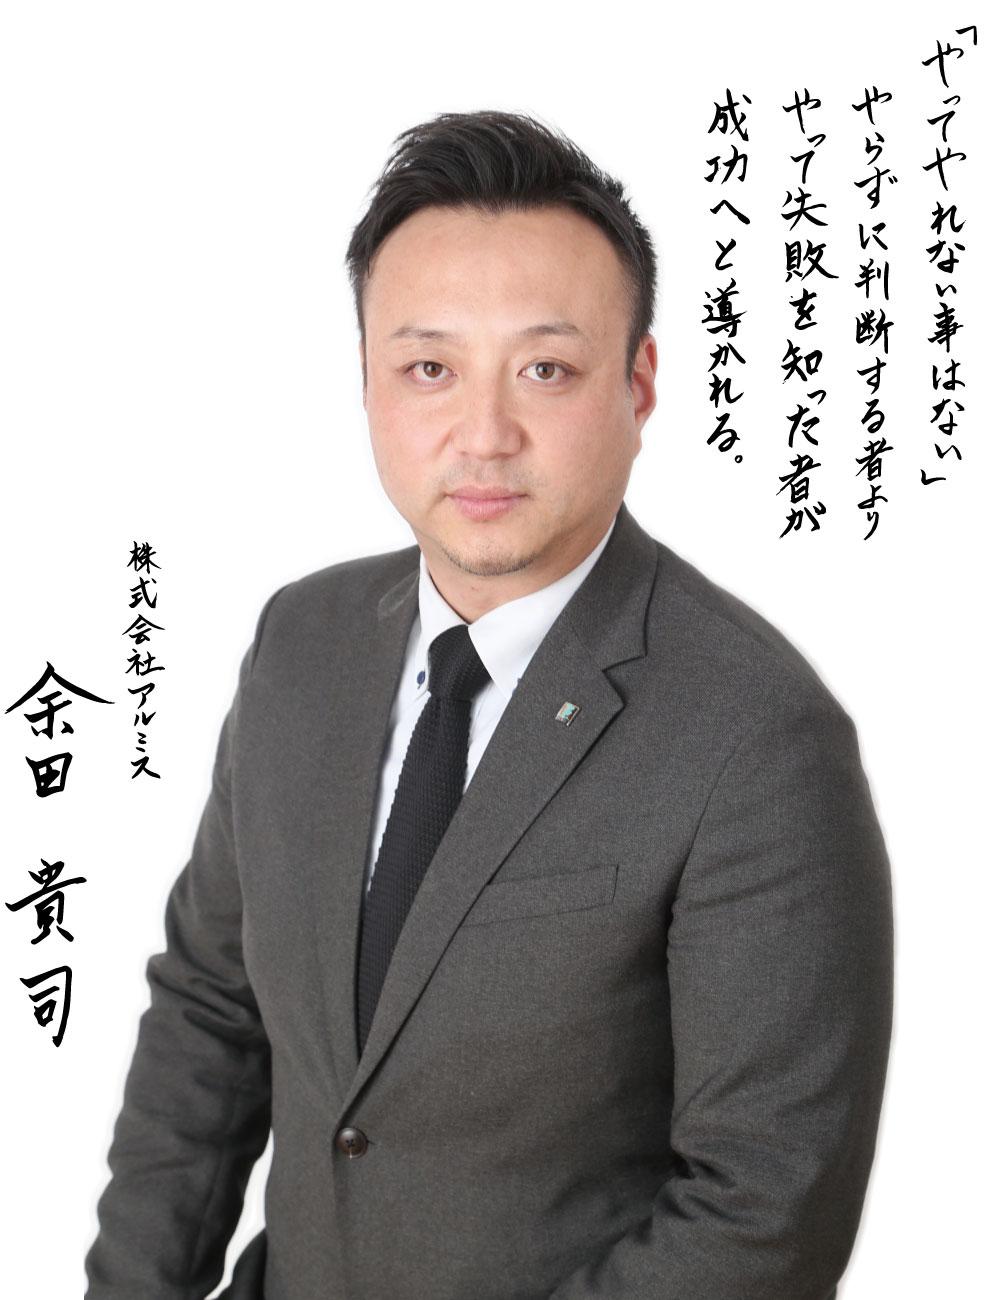 株式会社アルミス 代表取締役社長 余田貴司